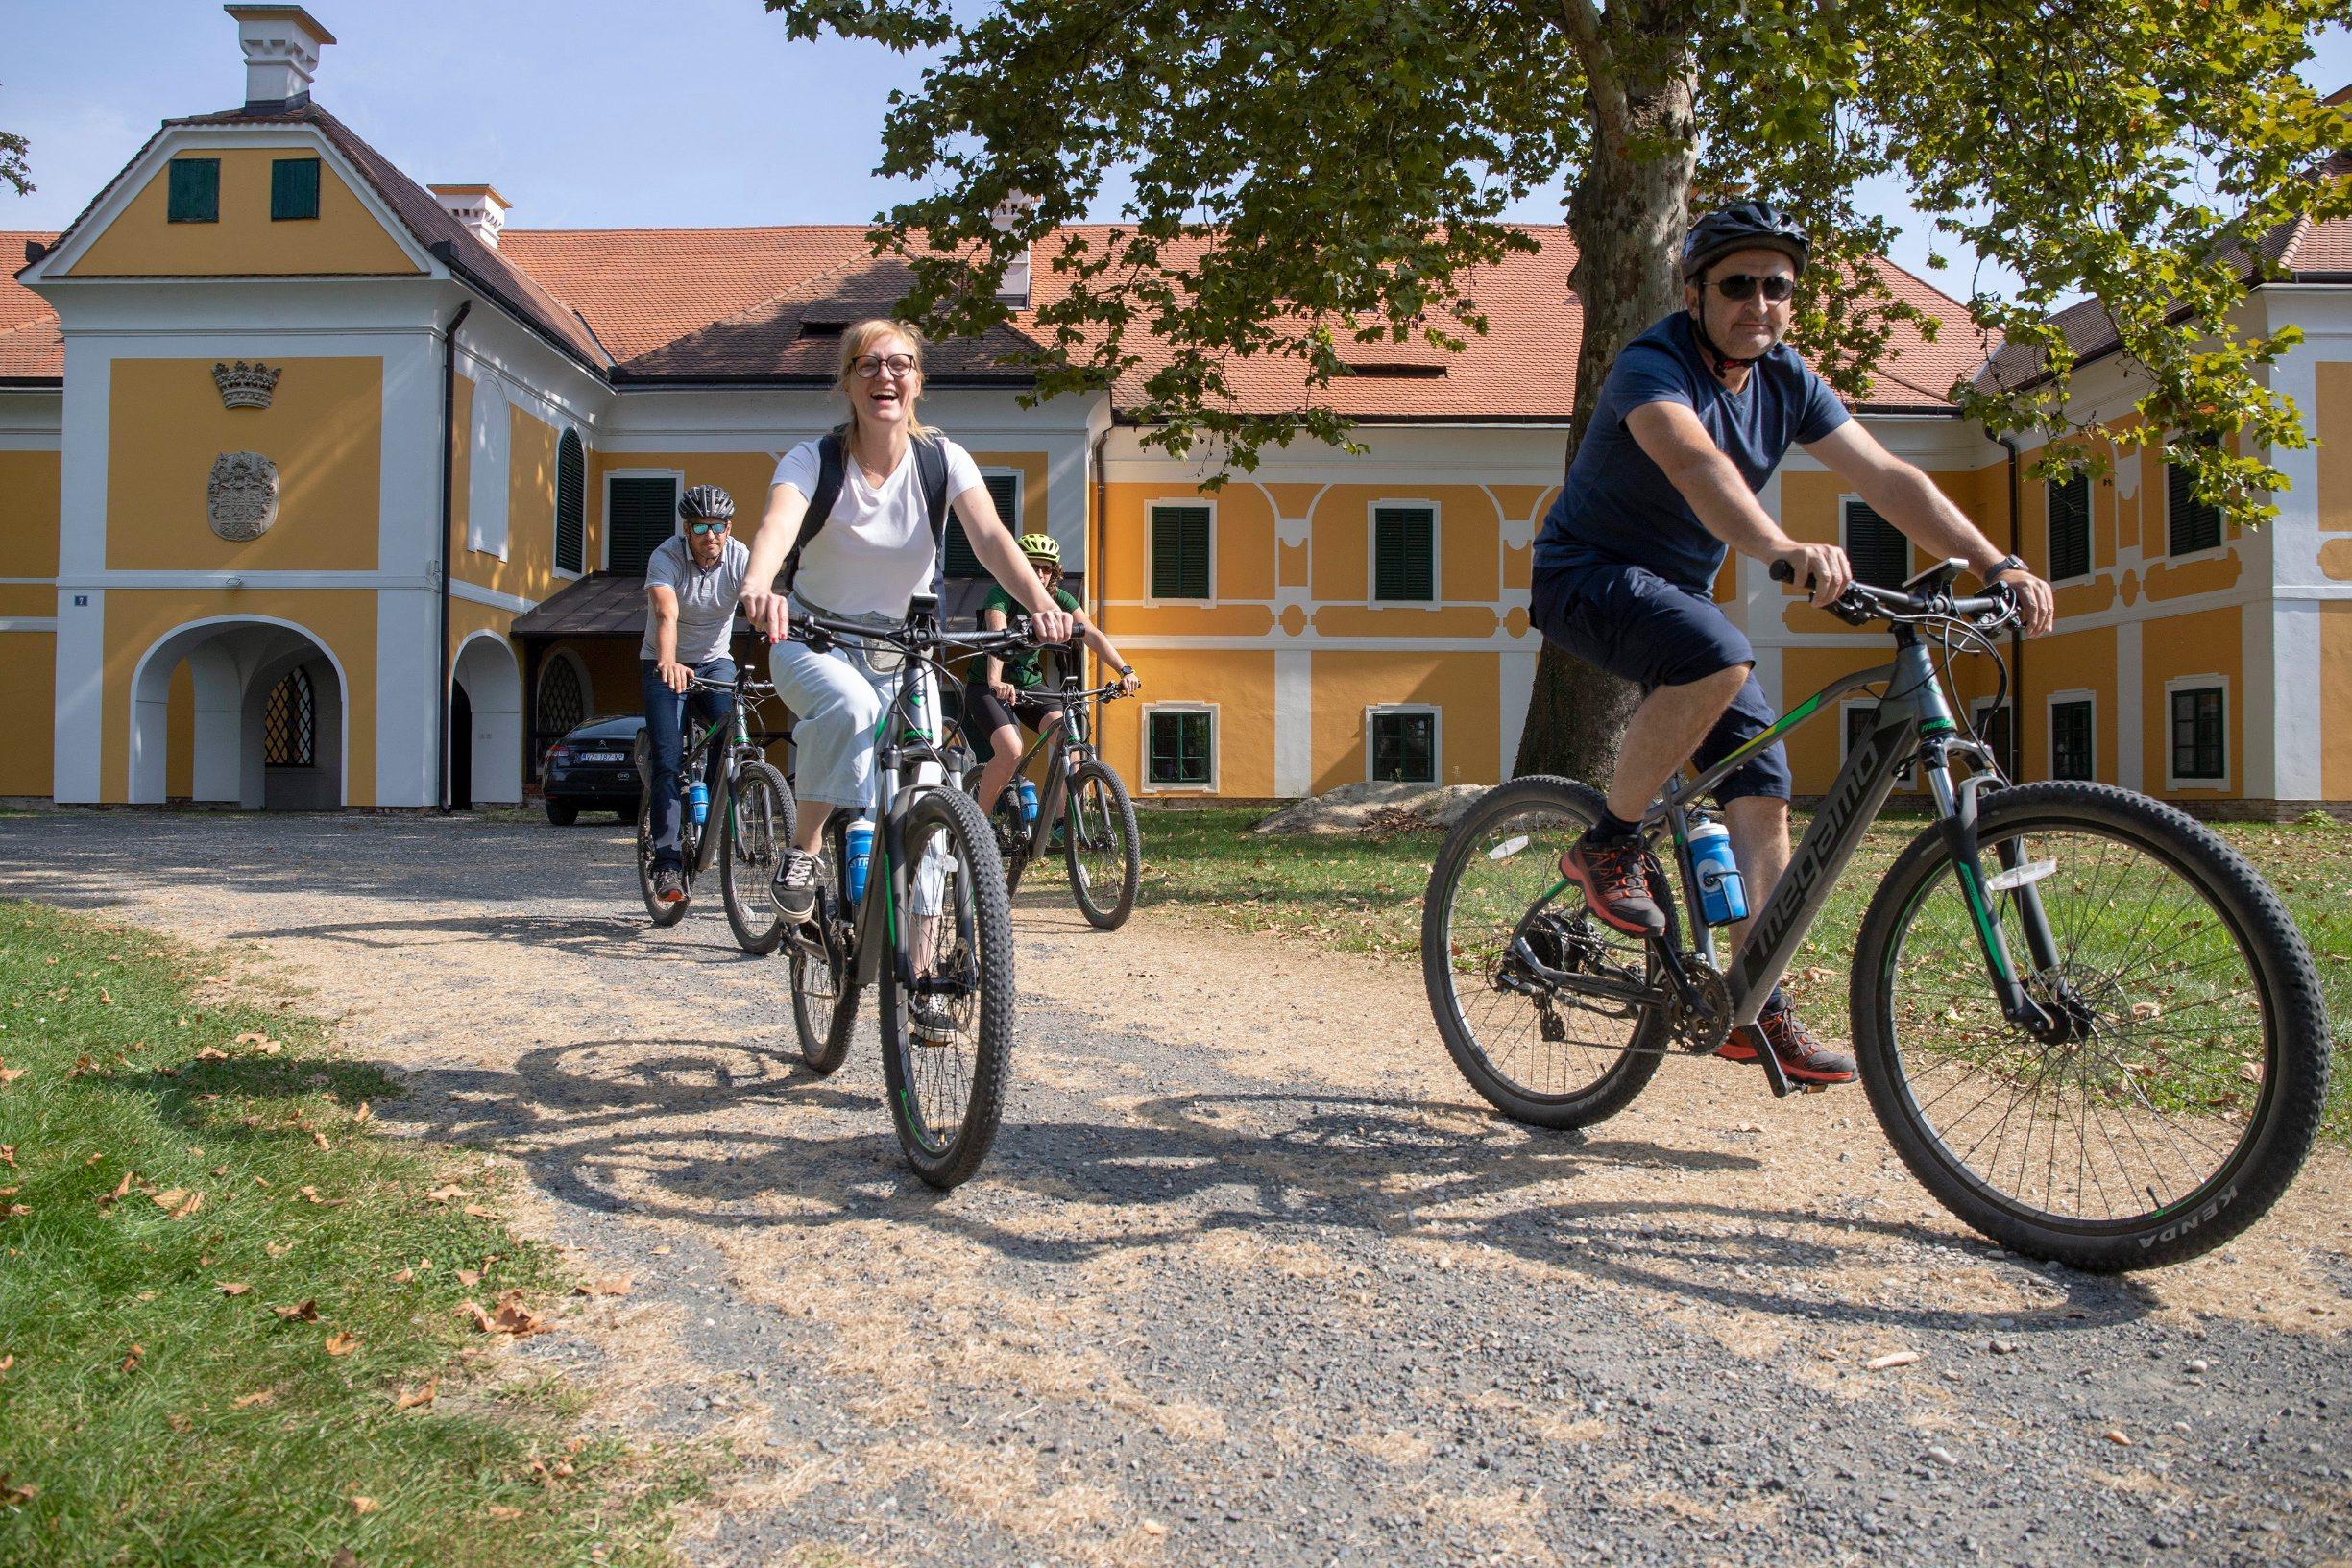 SPECIJAL LIKE JUTARNJI! Ludbreg, 210920. Reportaza o biciklistickoj stazi oko Ludbrega za Like. Na fotografiji: Veliki Bukovec. Foto: Zeljko Hajdinjak / CROPIX